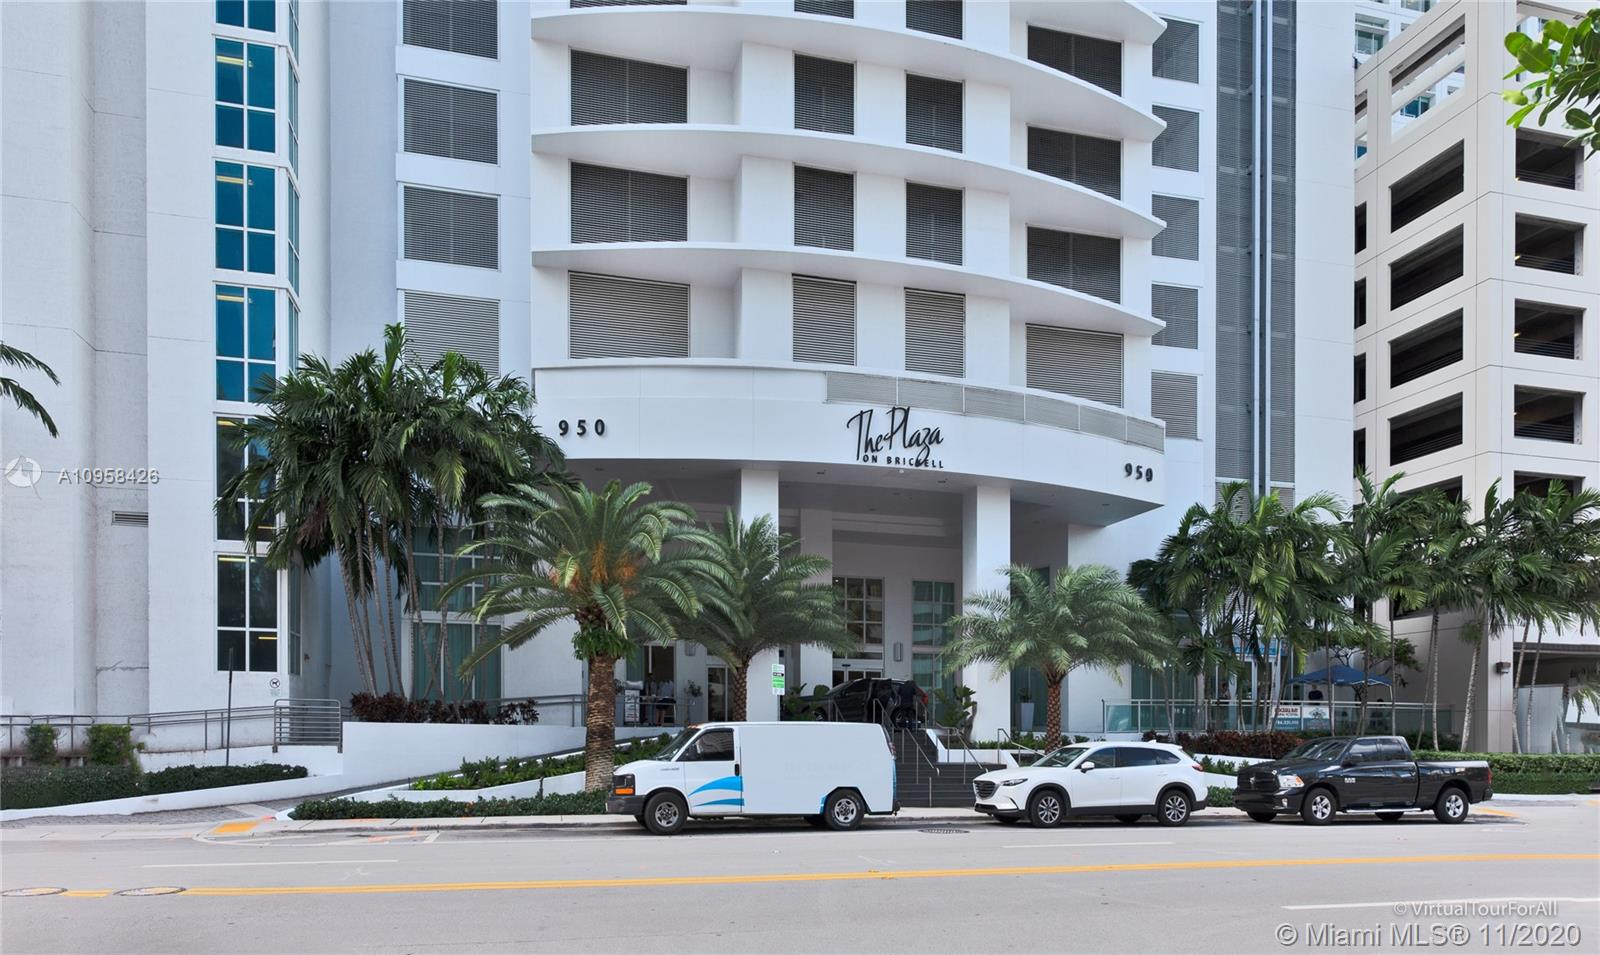 The Plaza on Brickell 1 #4210 - 950 Brickell Bay Dr #4210, Miami, FL 33131